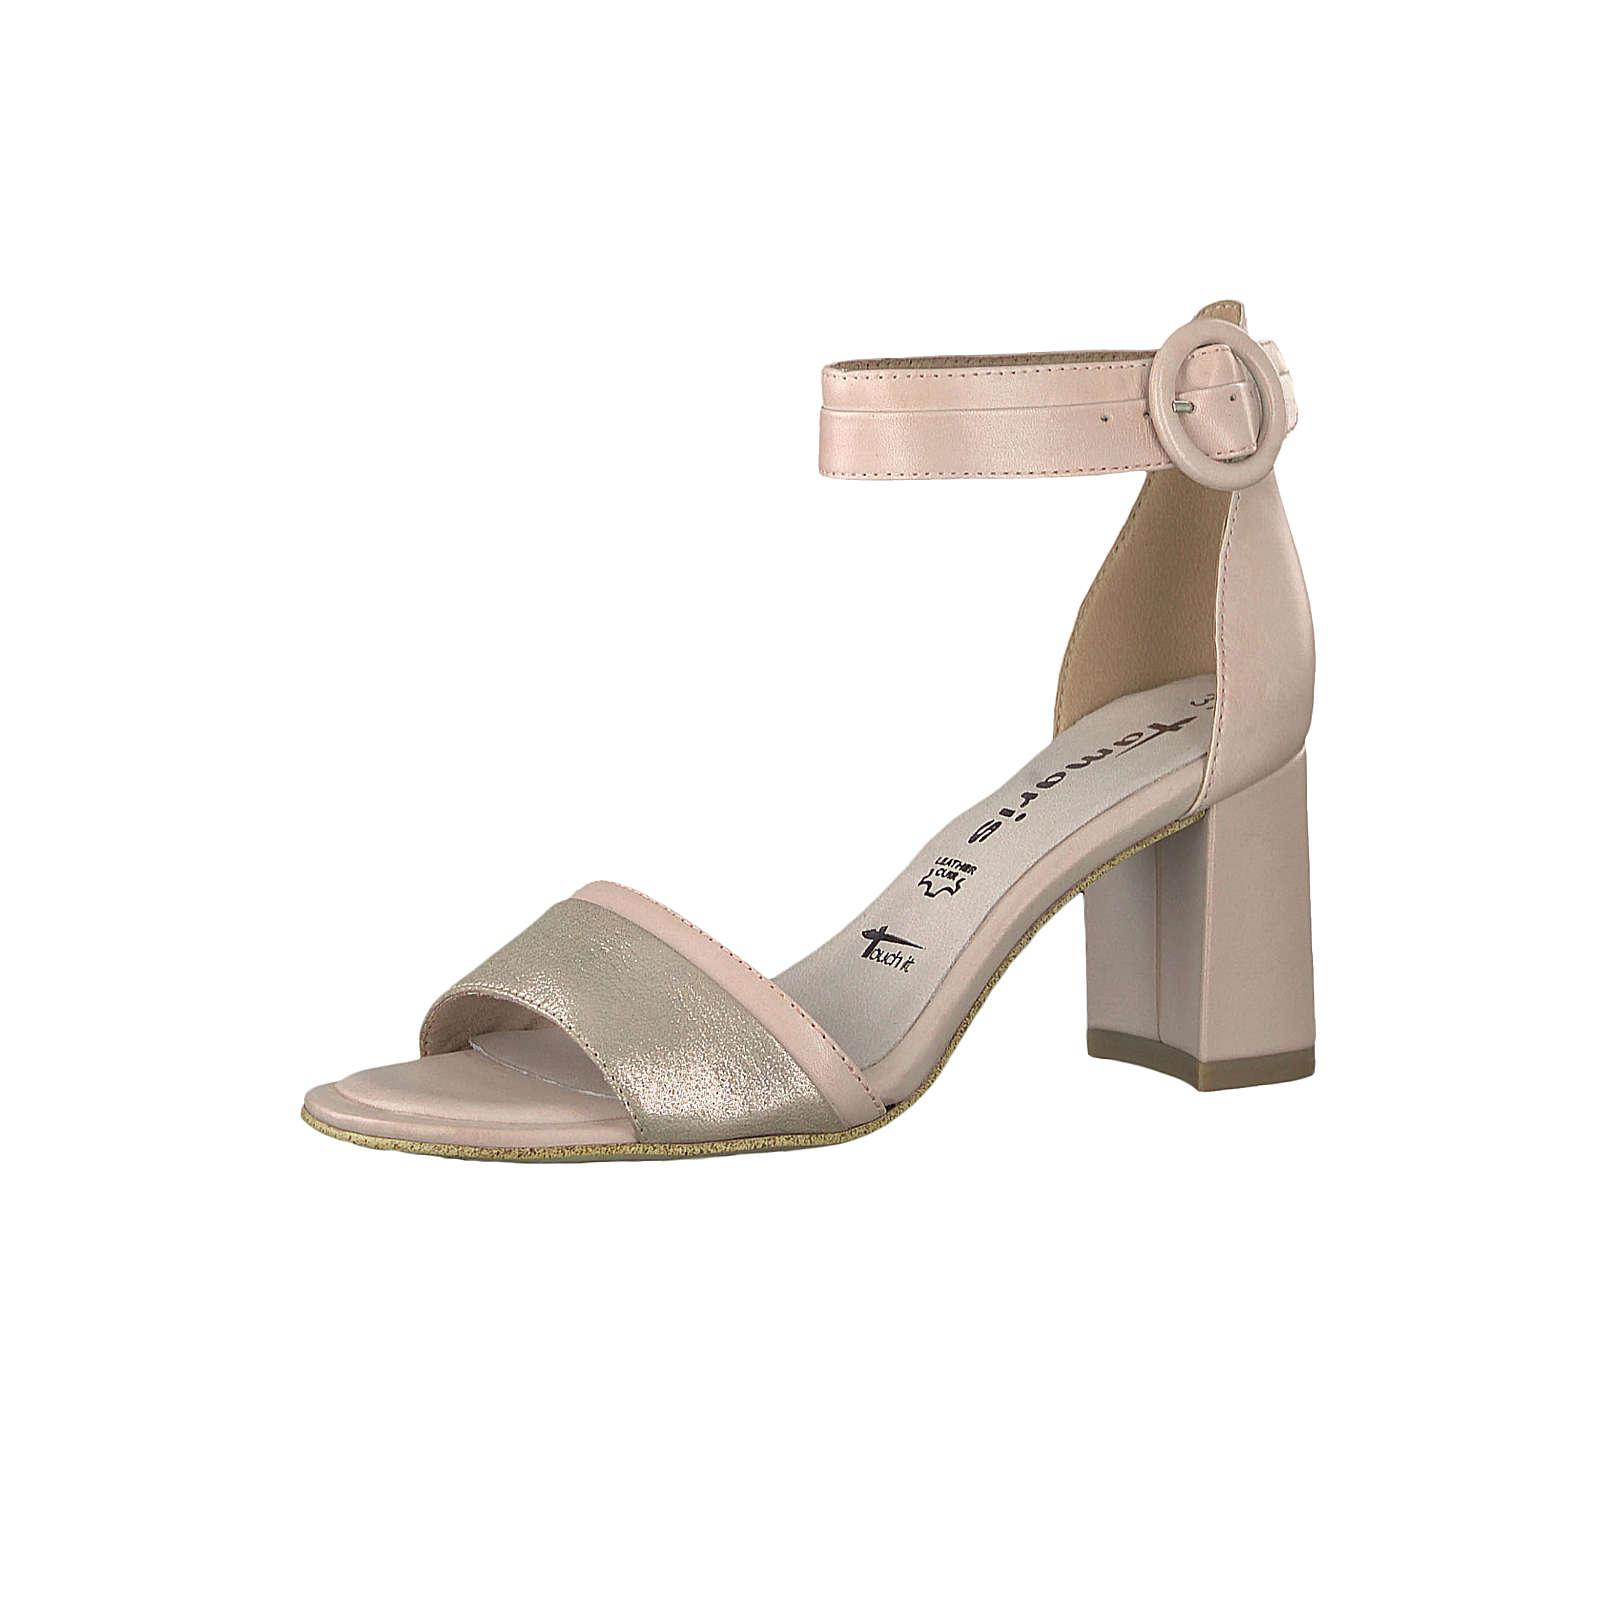 Tamaris 1-28379-22 645 Damen Powder Comb Creme Beige Sandaletten Ankle Cuff Sandale mit TOUCH-IT Sohle Klassische Sandalen beige Damen Gr. 36